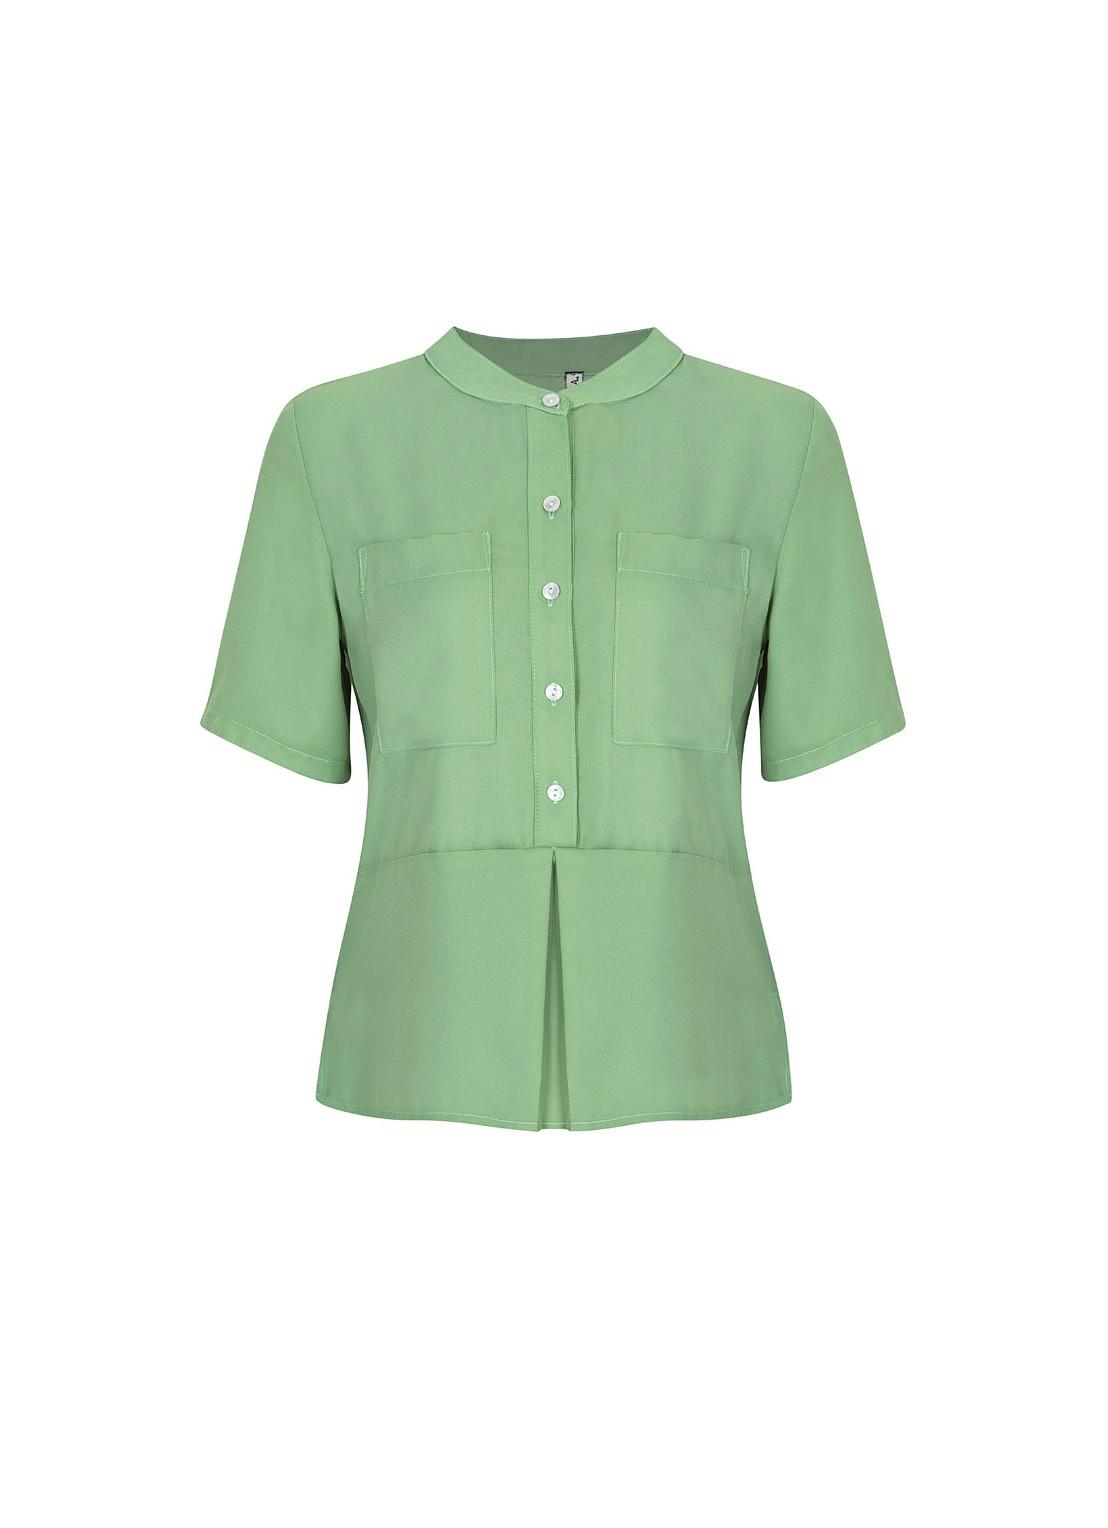 Camisa manga corta pistache